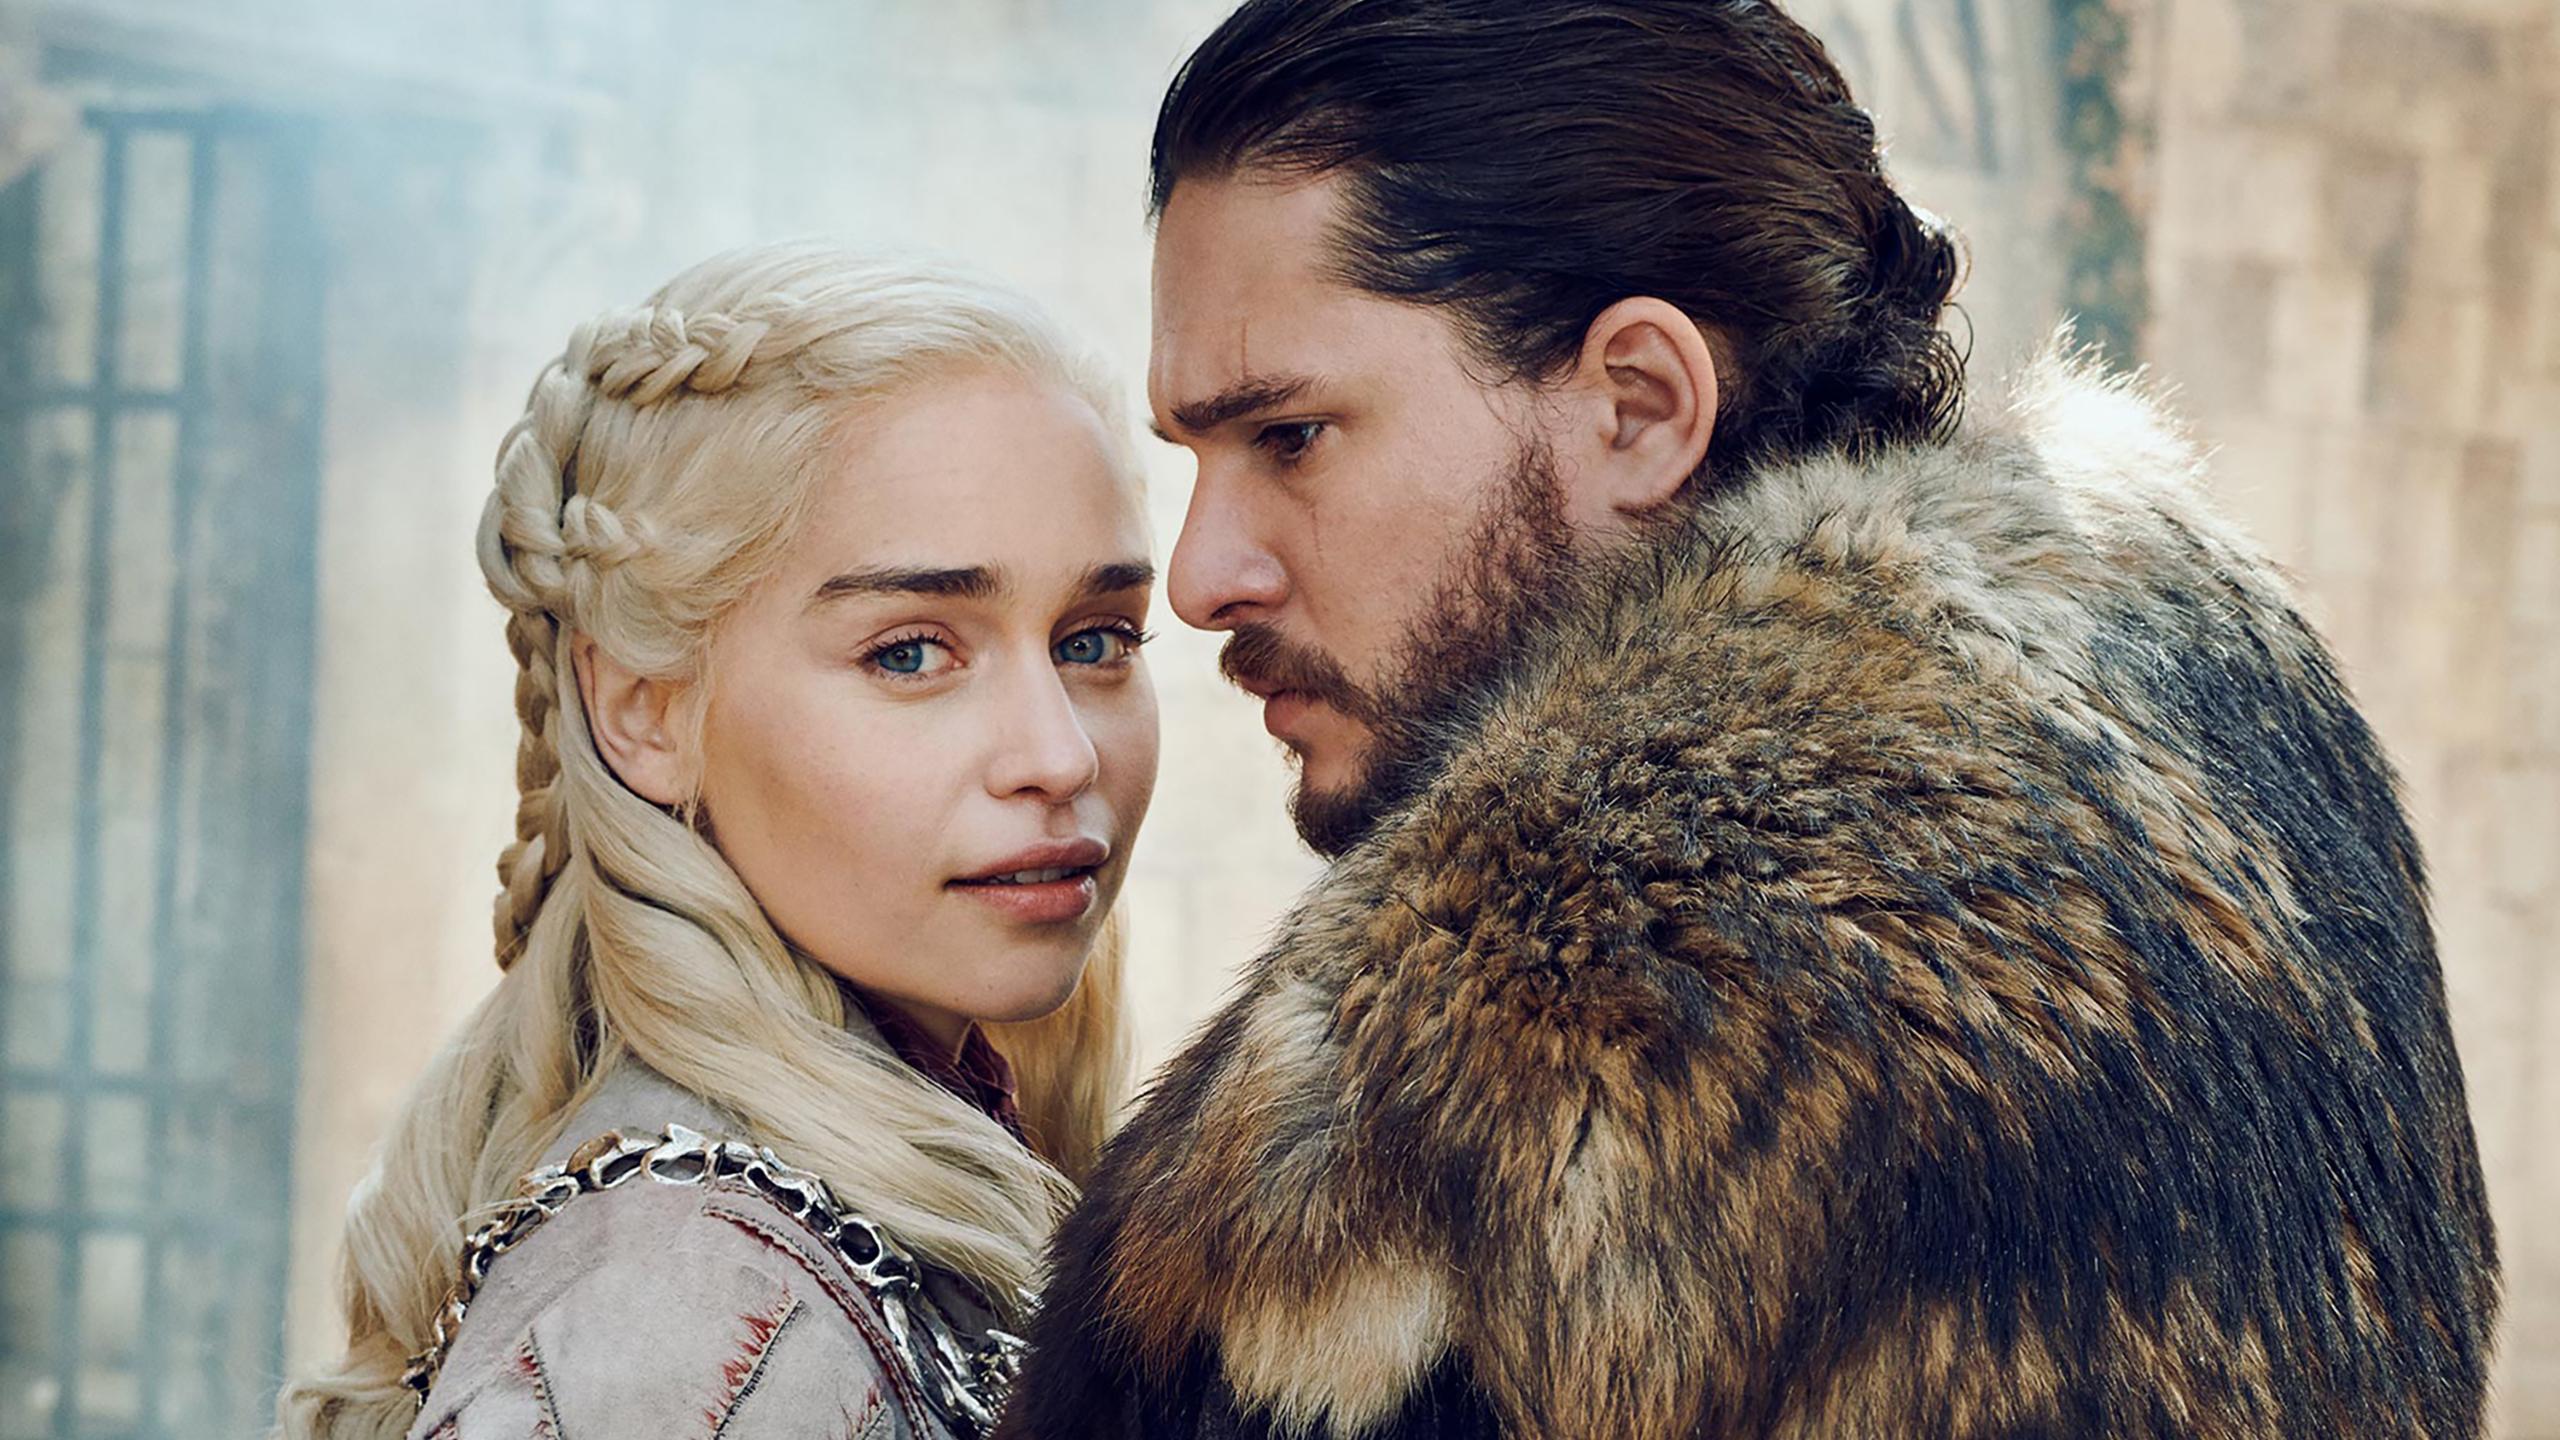 jon_snow_daenerys_targaryen_in_got_season_8 Day in the Life: Daenerys Targaryen